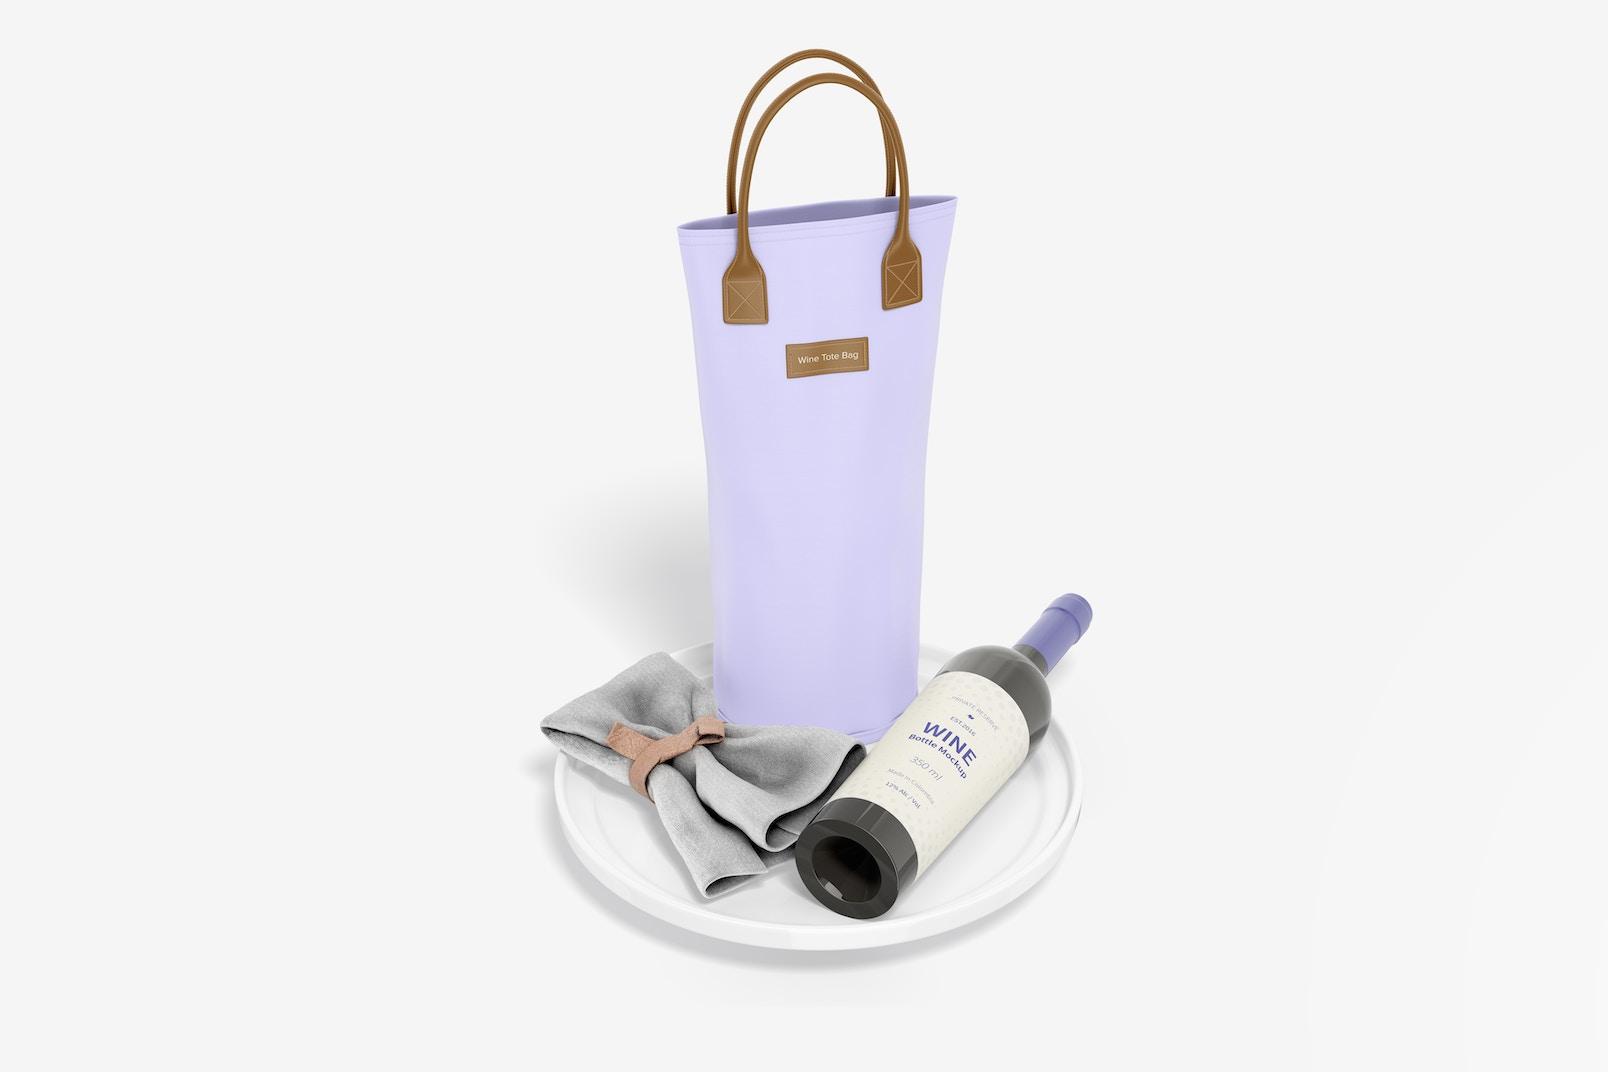 Wine Tote Bag Mockup, Perspective